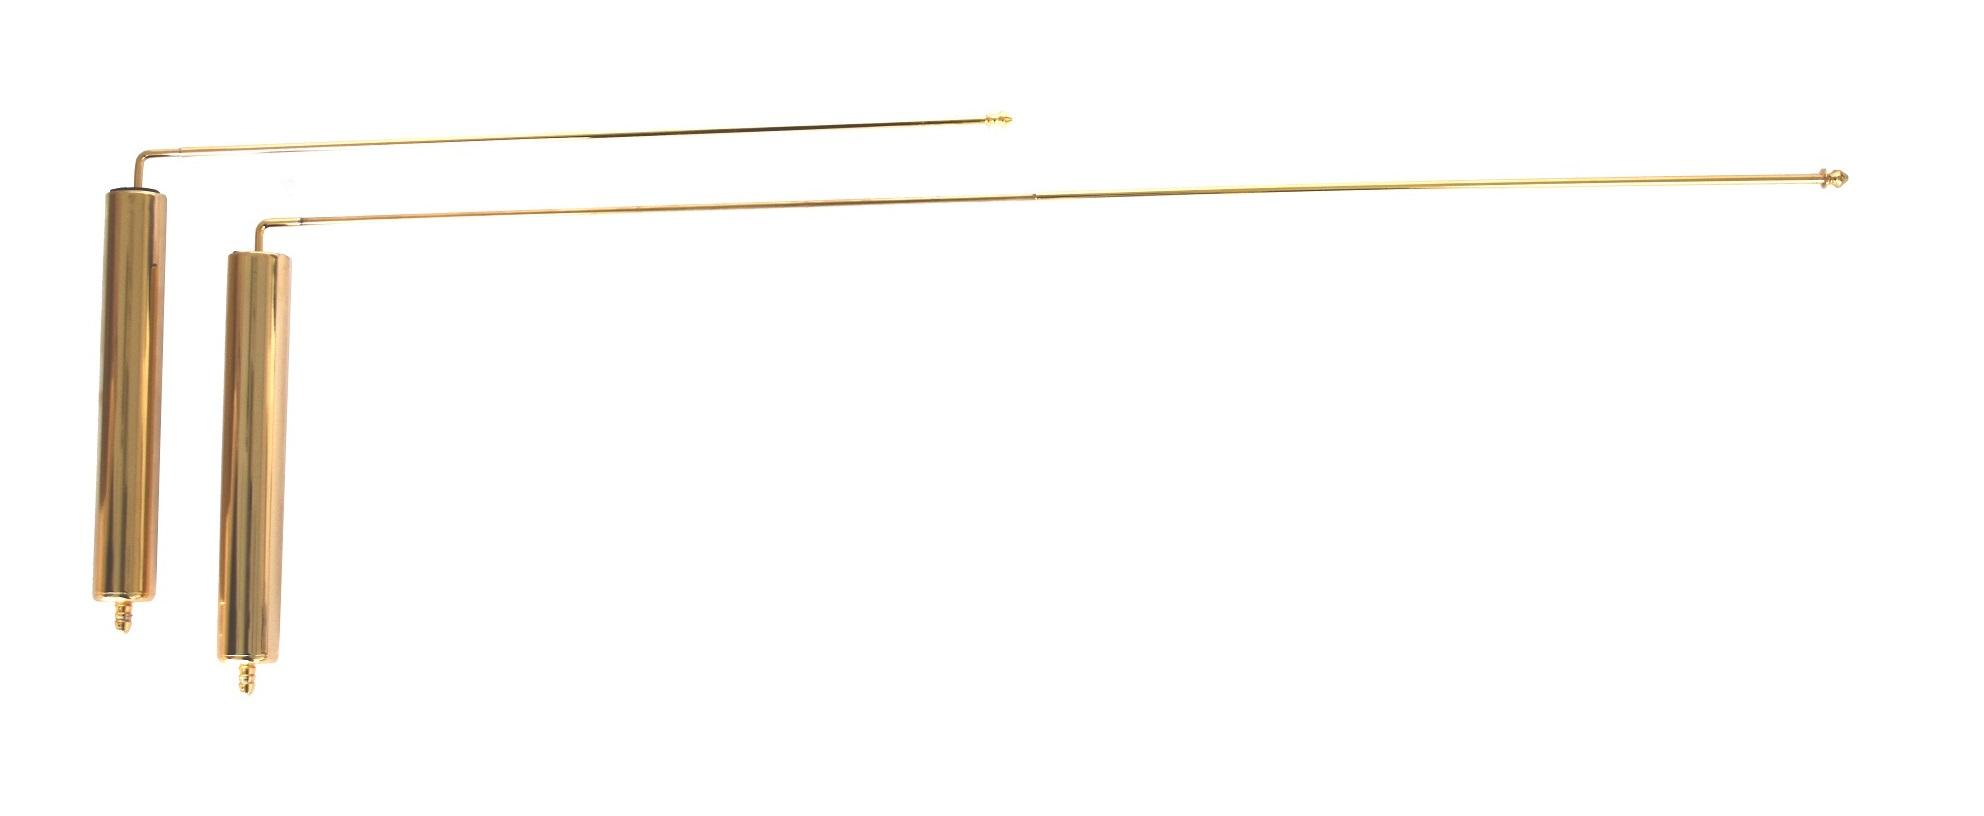 TELERODS set telescopic gold dowsing rods